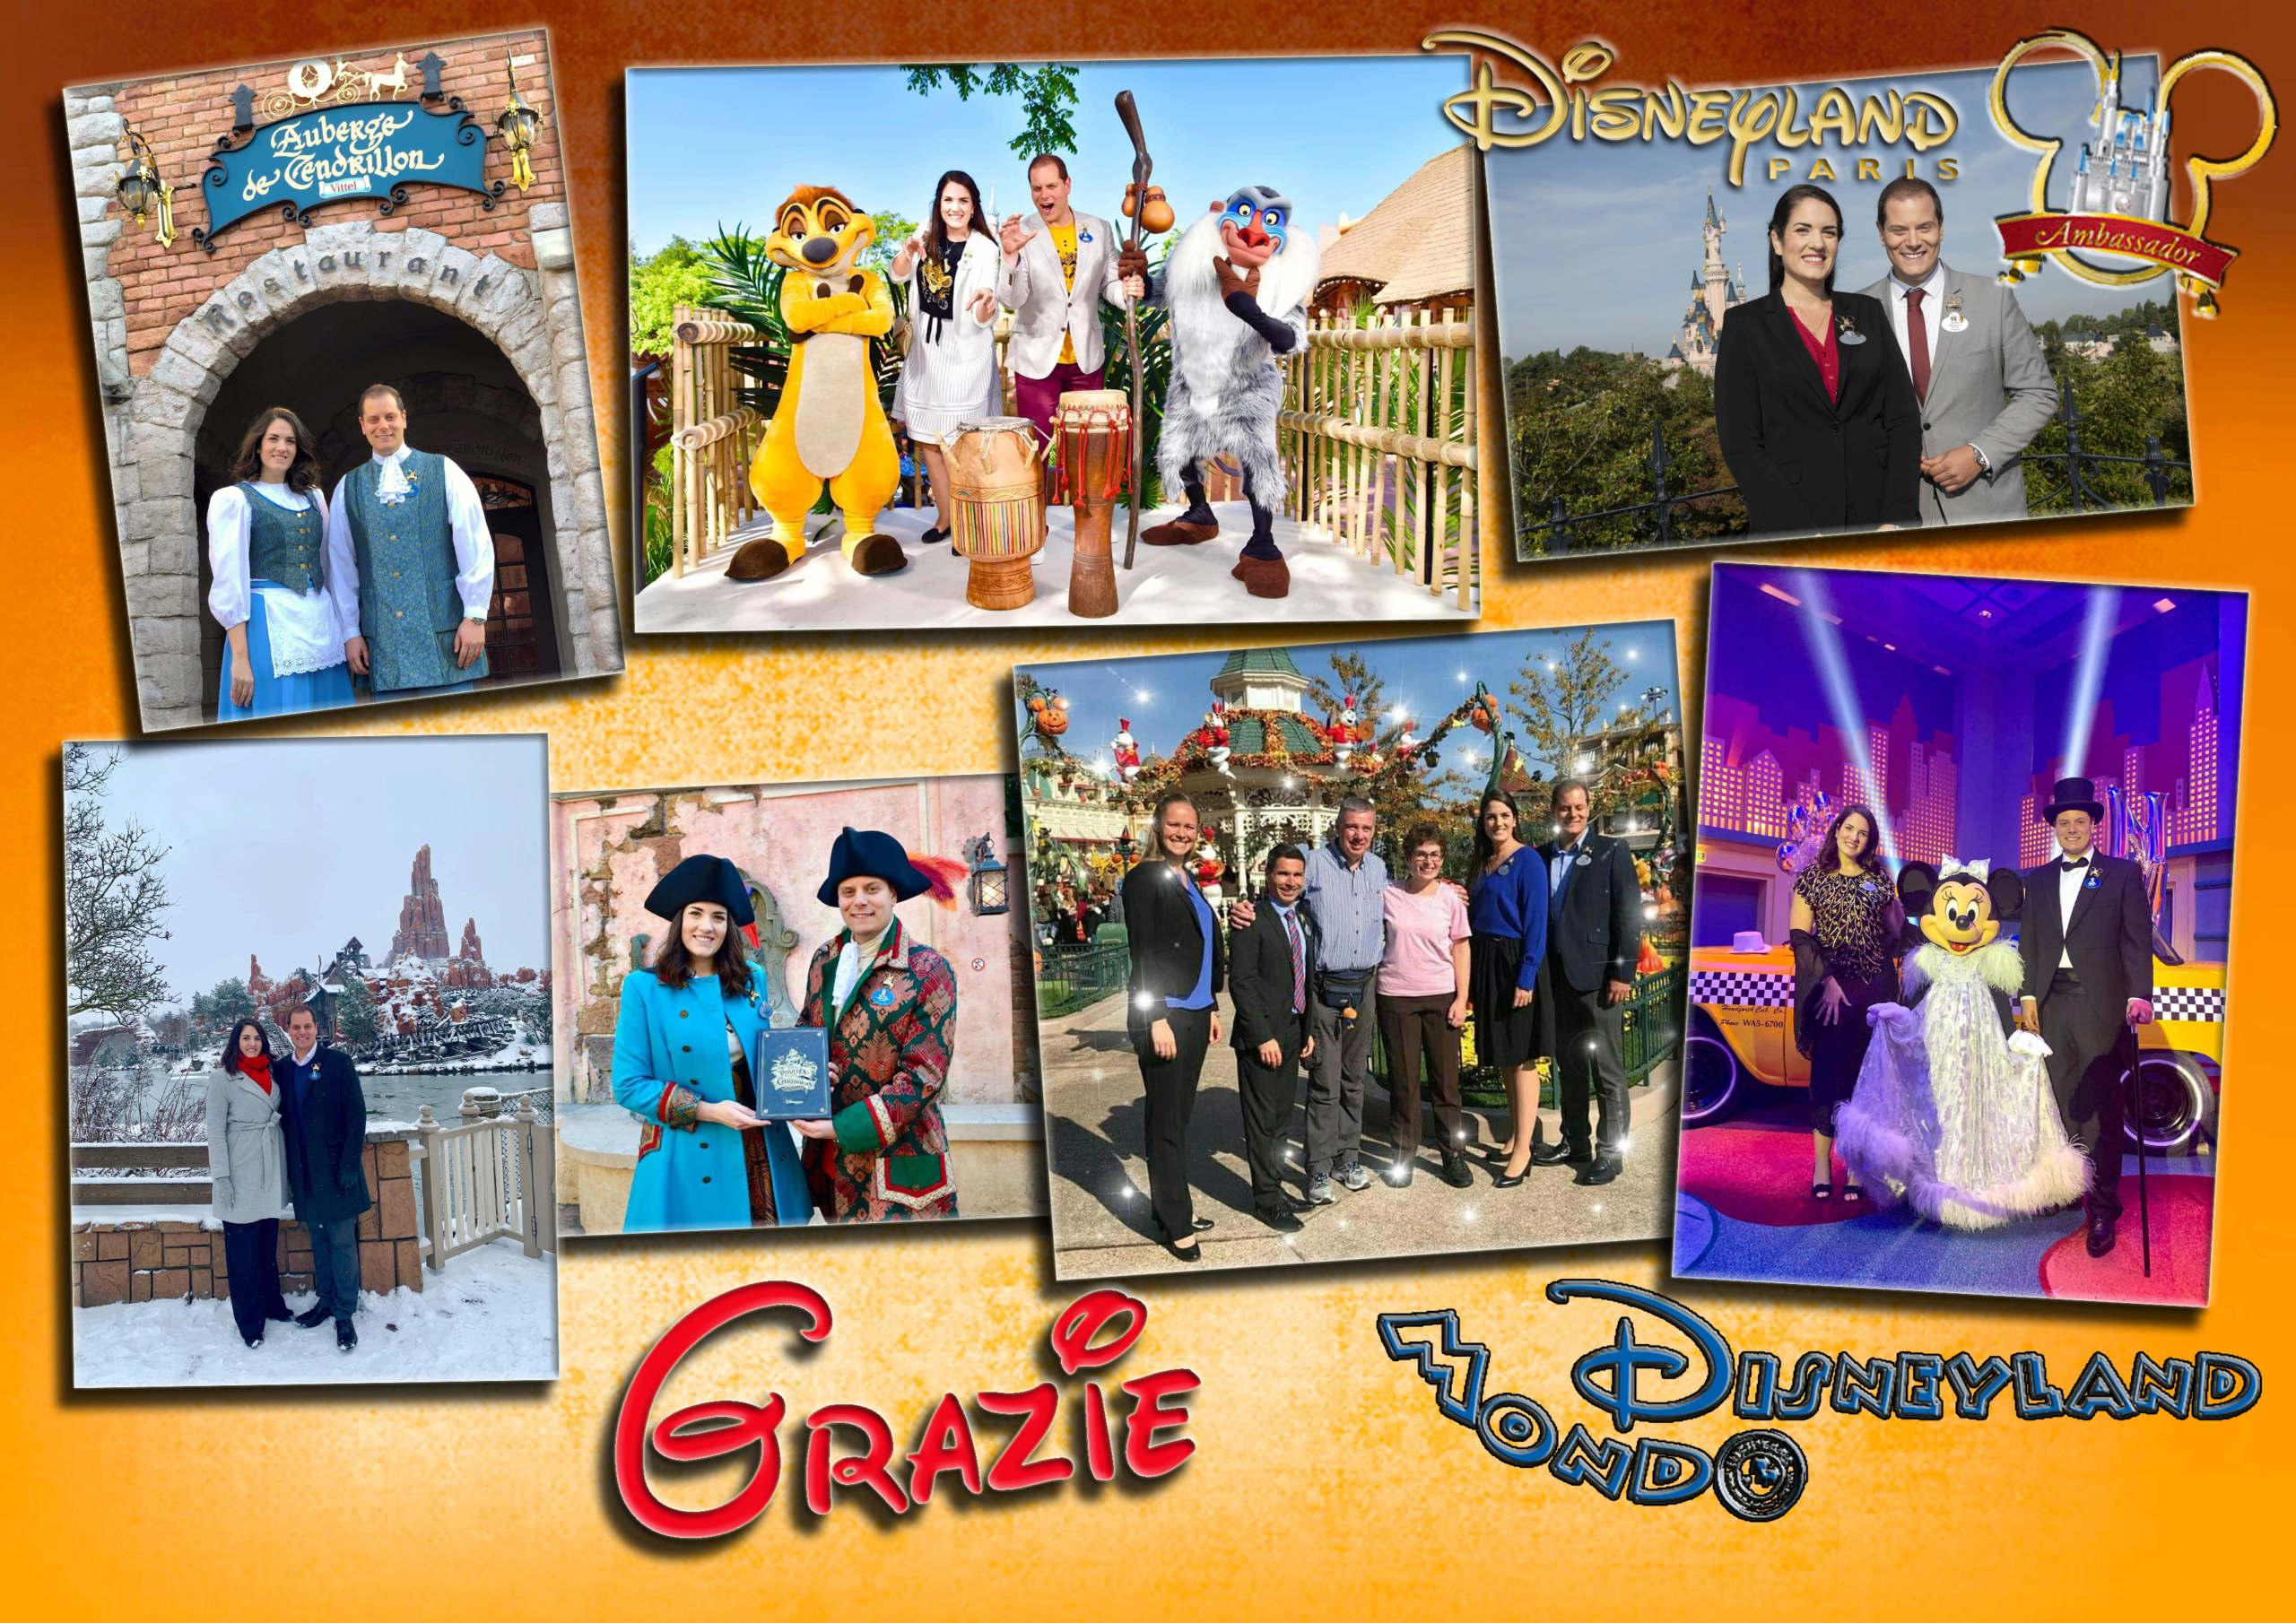 Ambasciatori Disneyland Paris 2019 - 2020 - Pagina 4 Ambasc10